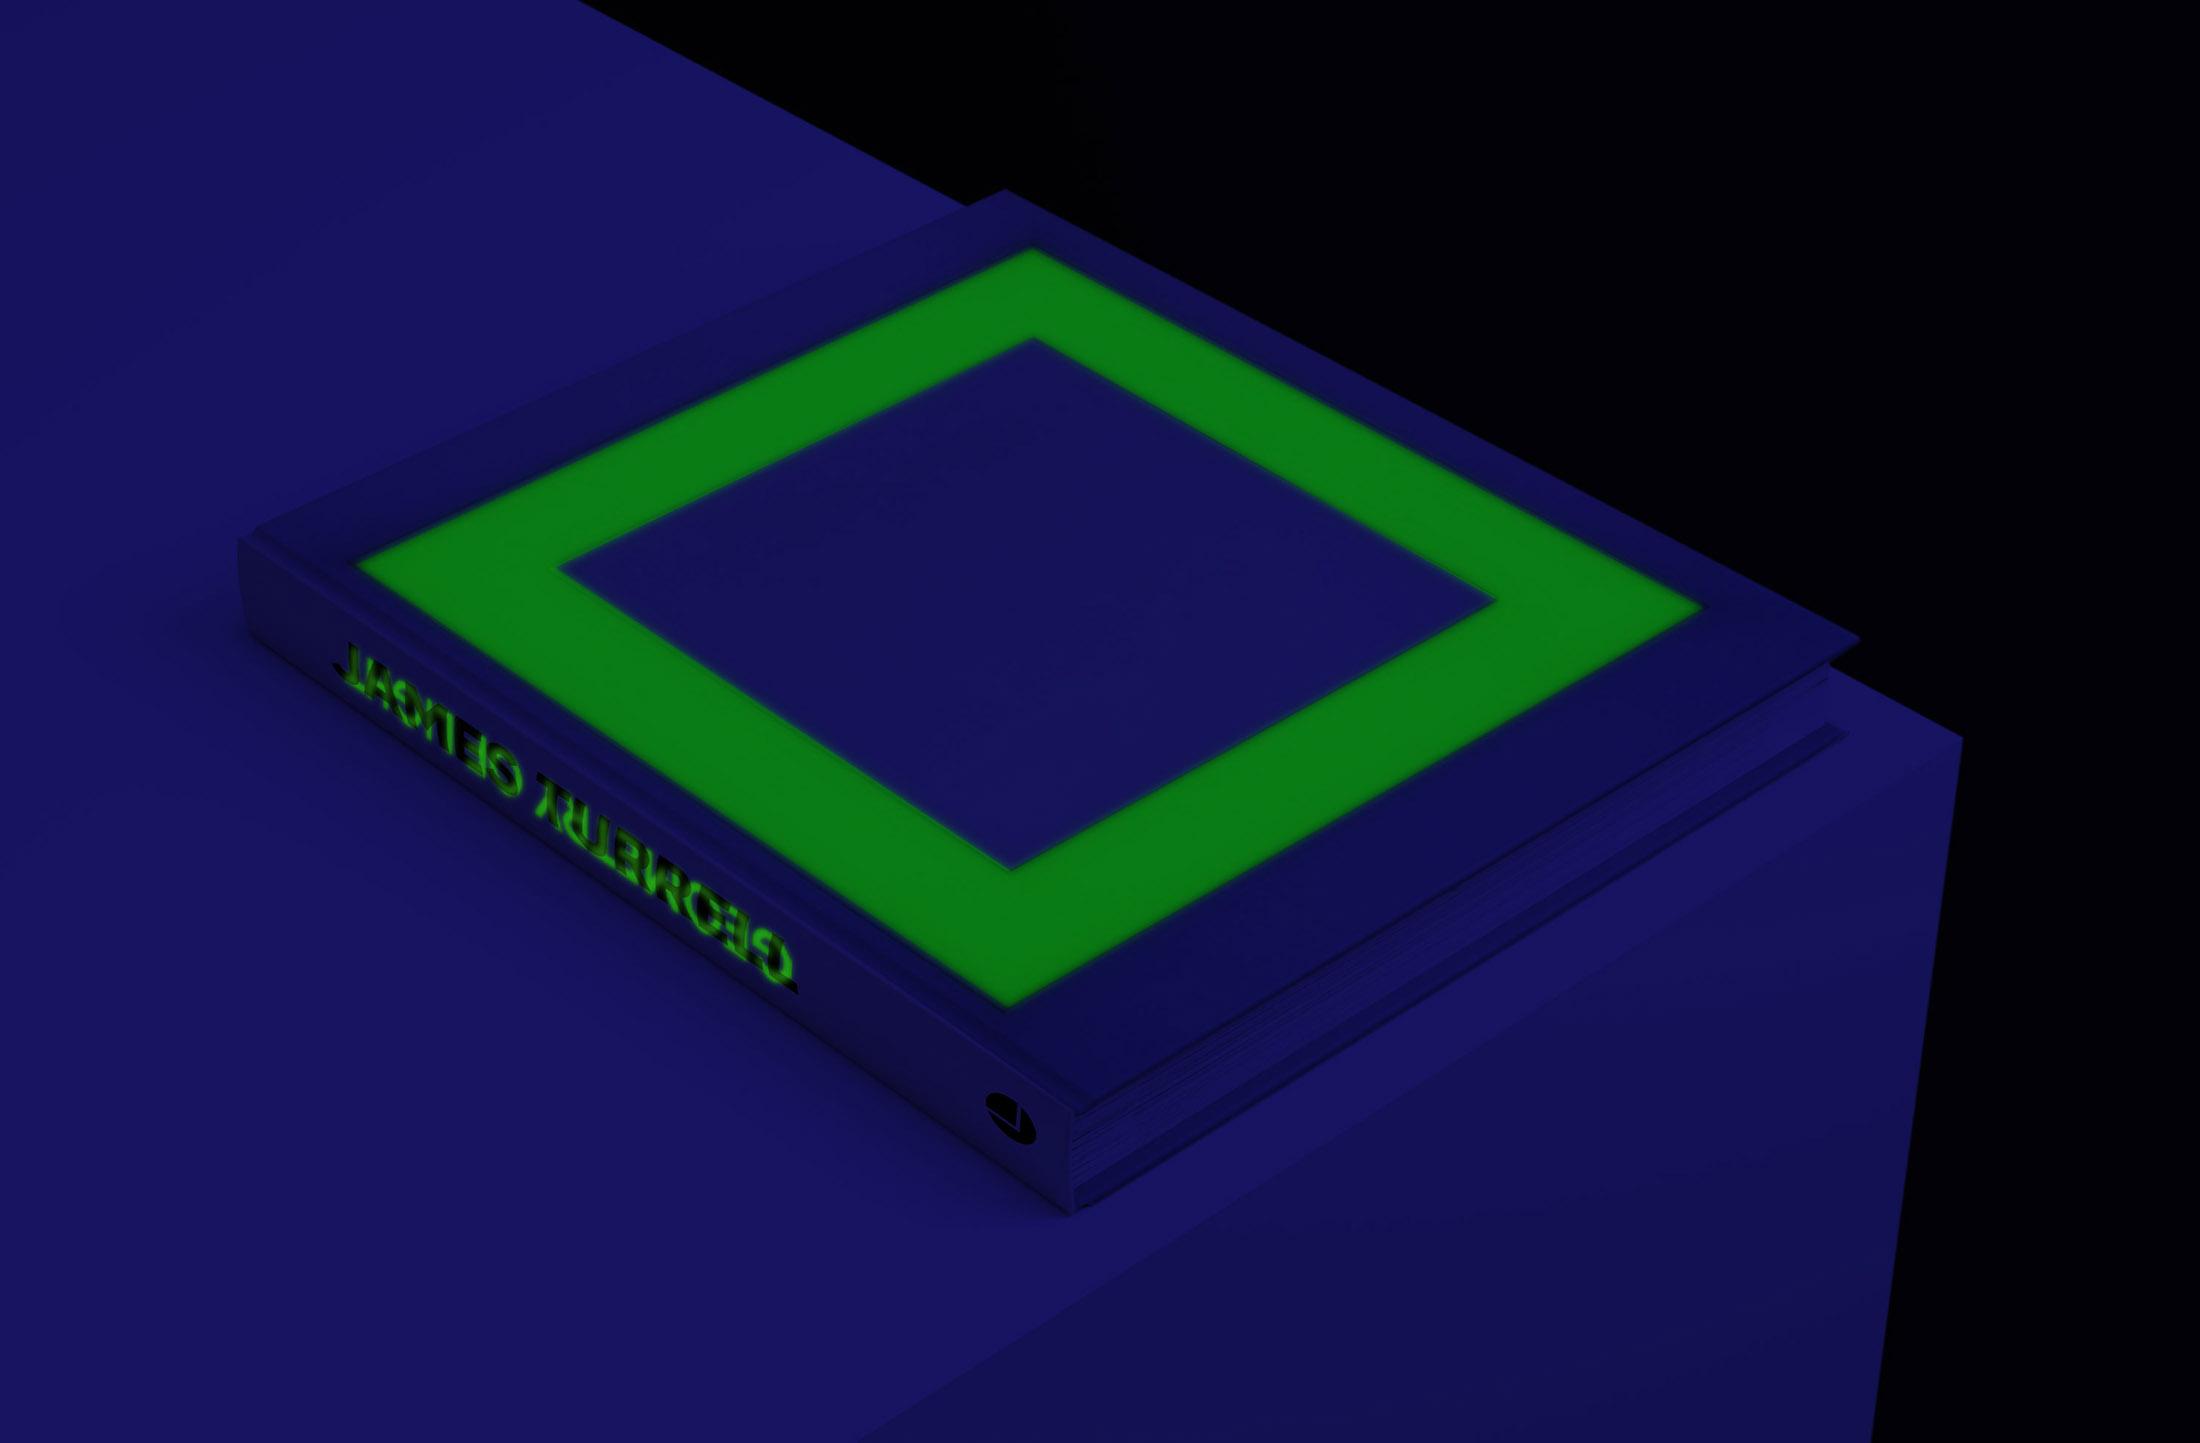 Geometry of light book in the dark